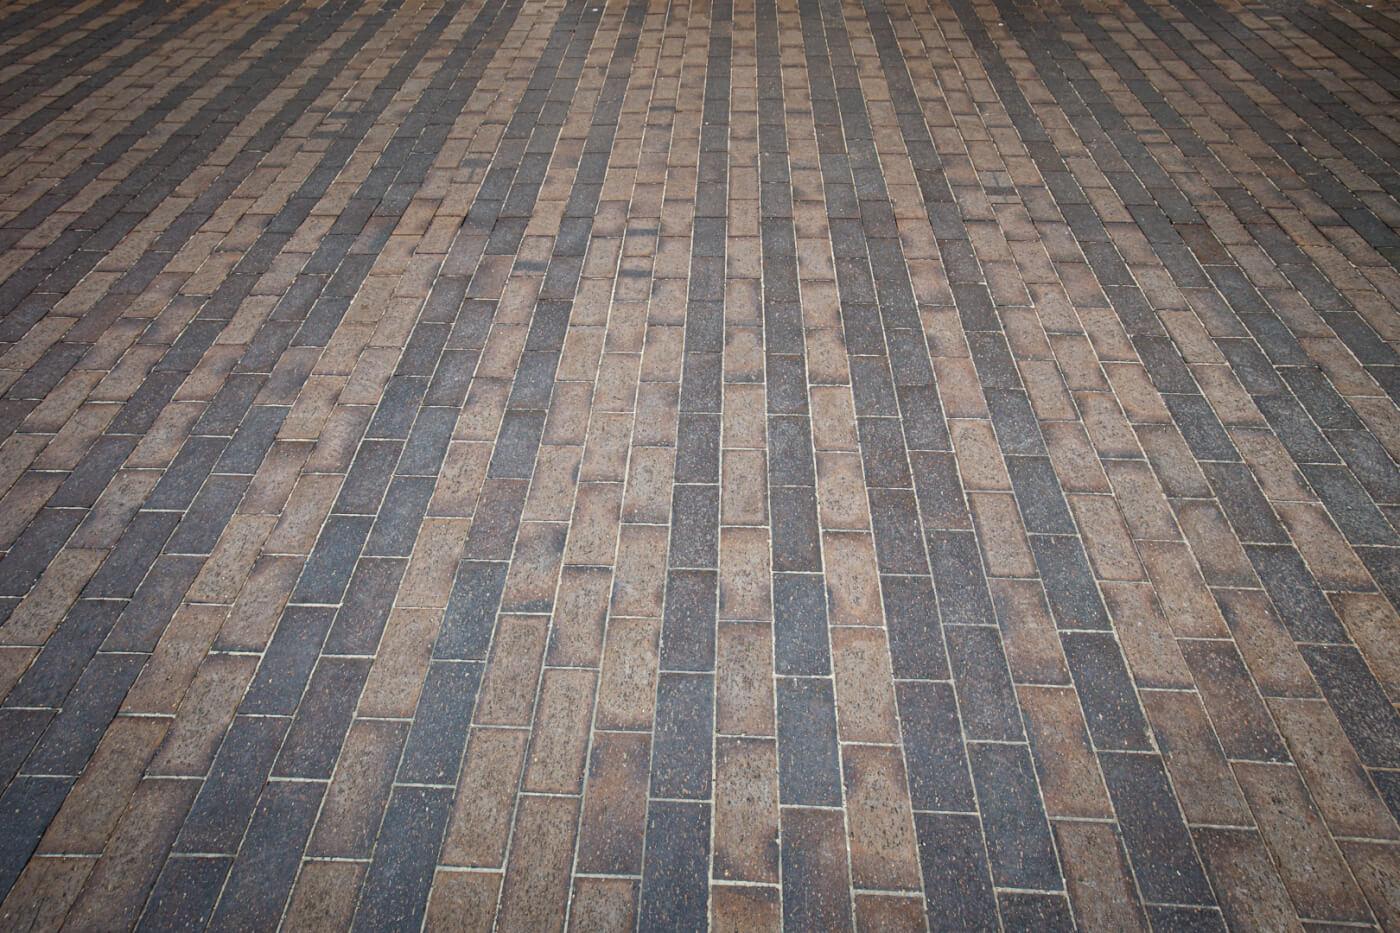 Victor Harbour Main Street Mahogany Pavers Littlehampton Brick Co Rs 9